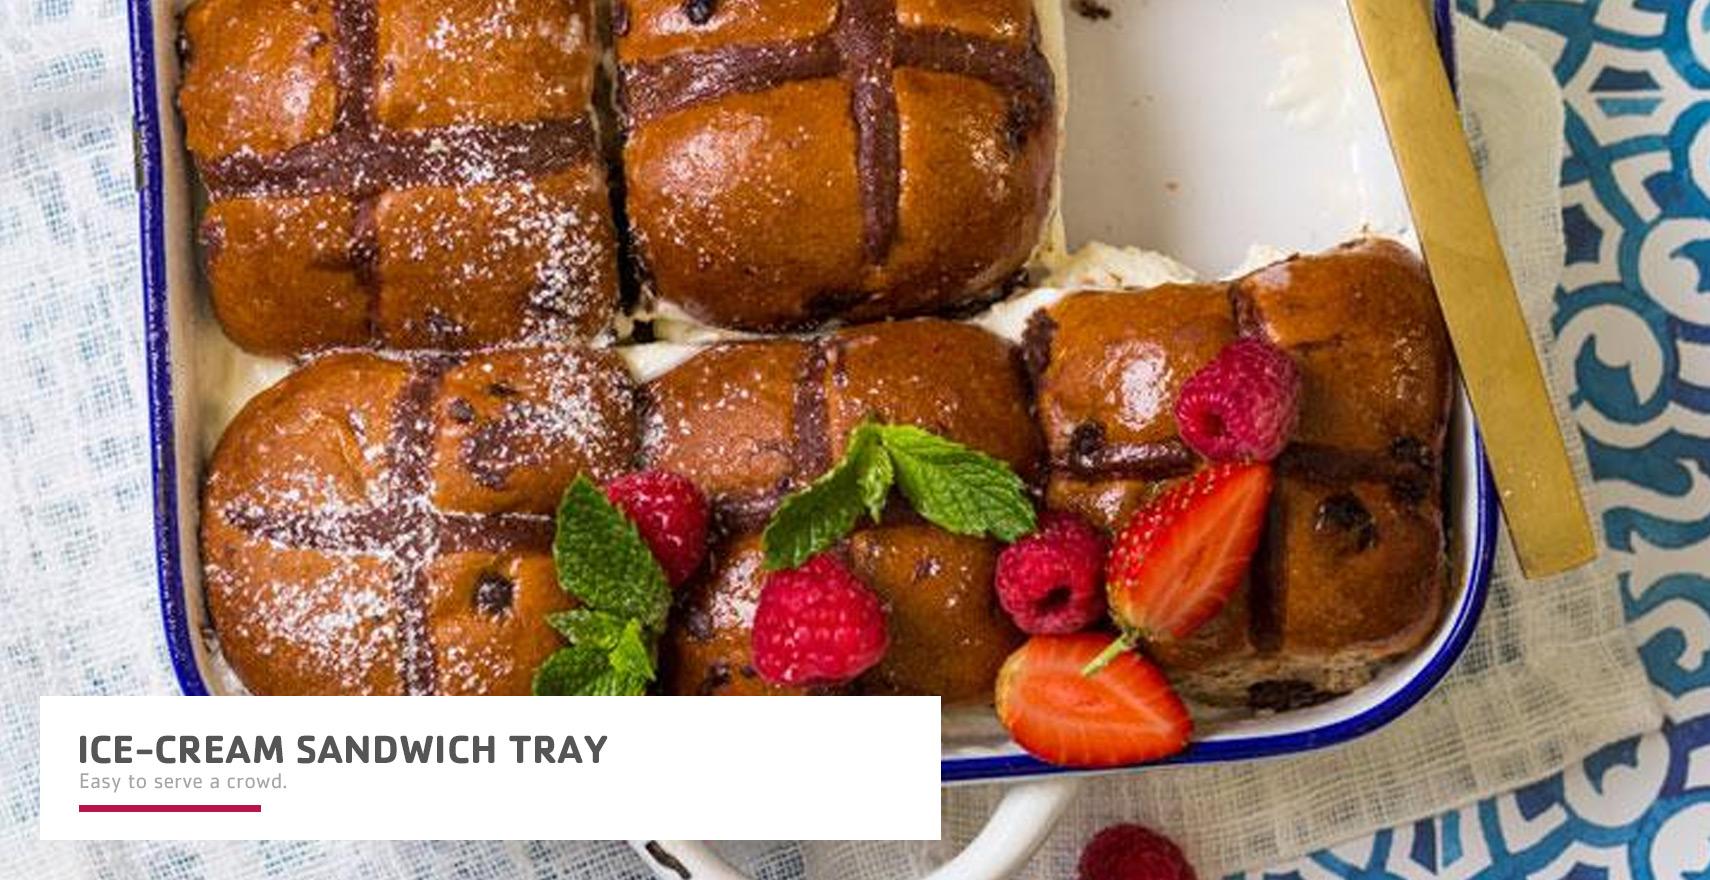 icecream-sandwich-tray.jpg